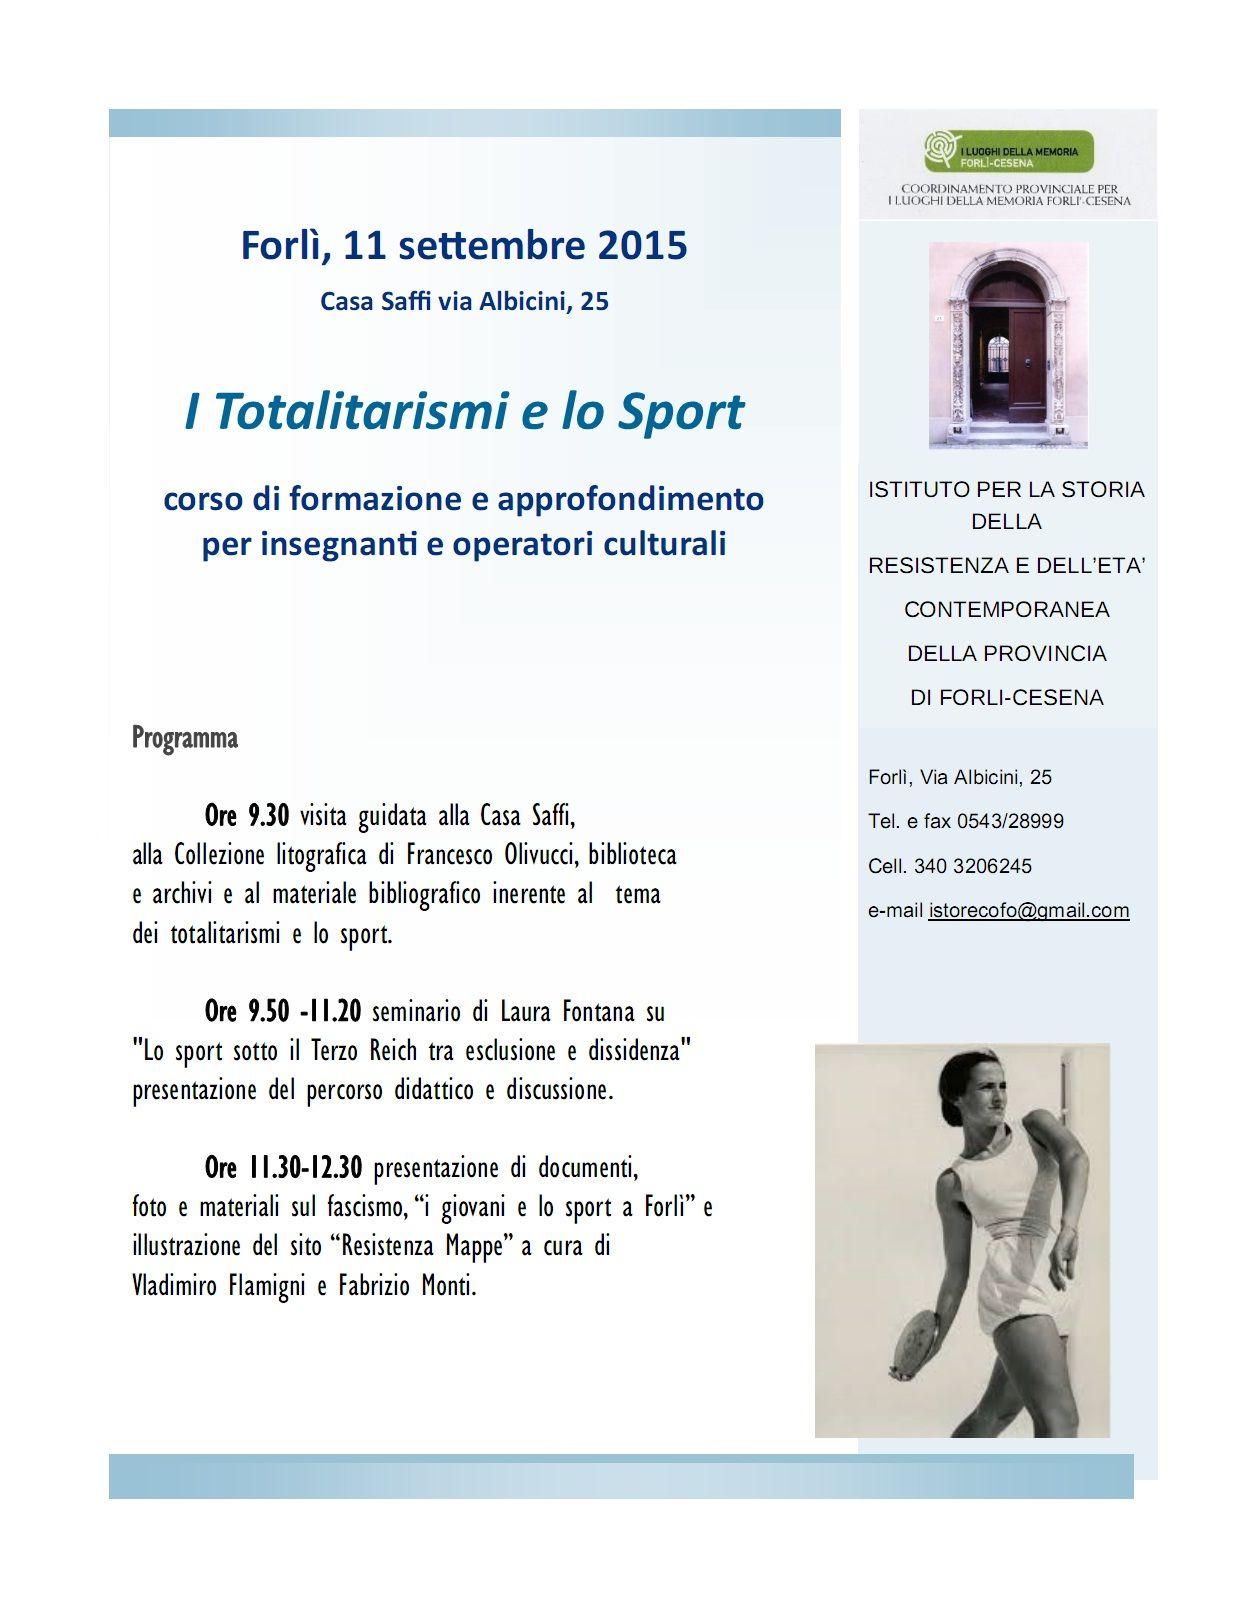 I_totalitarismi_e_lo_sport